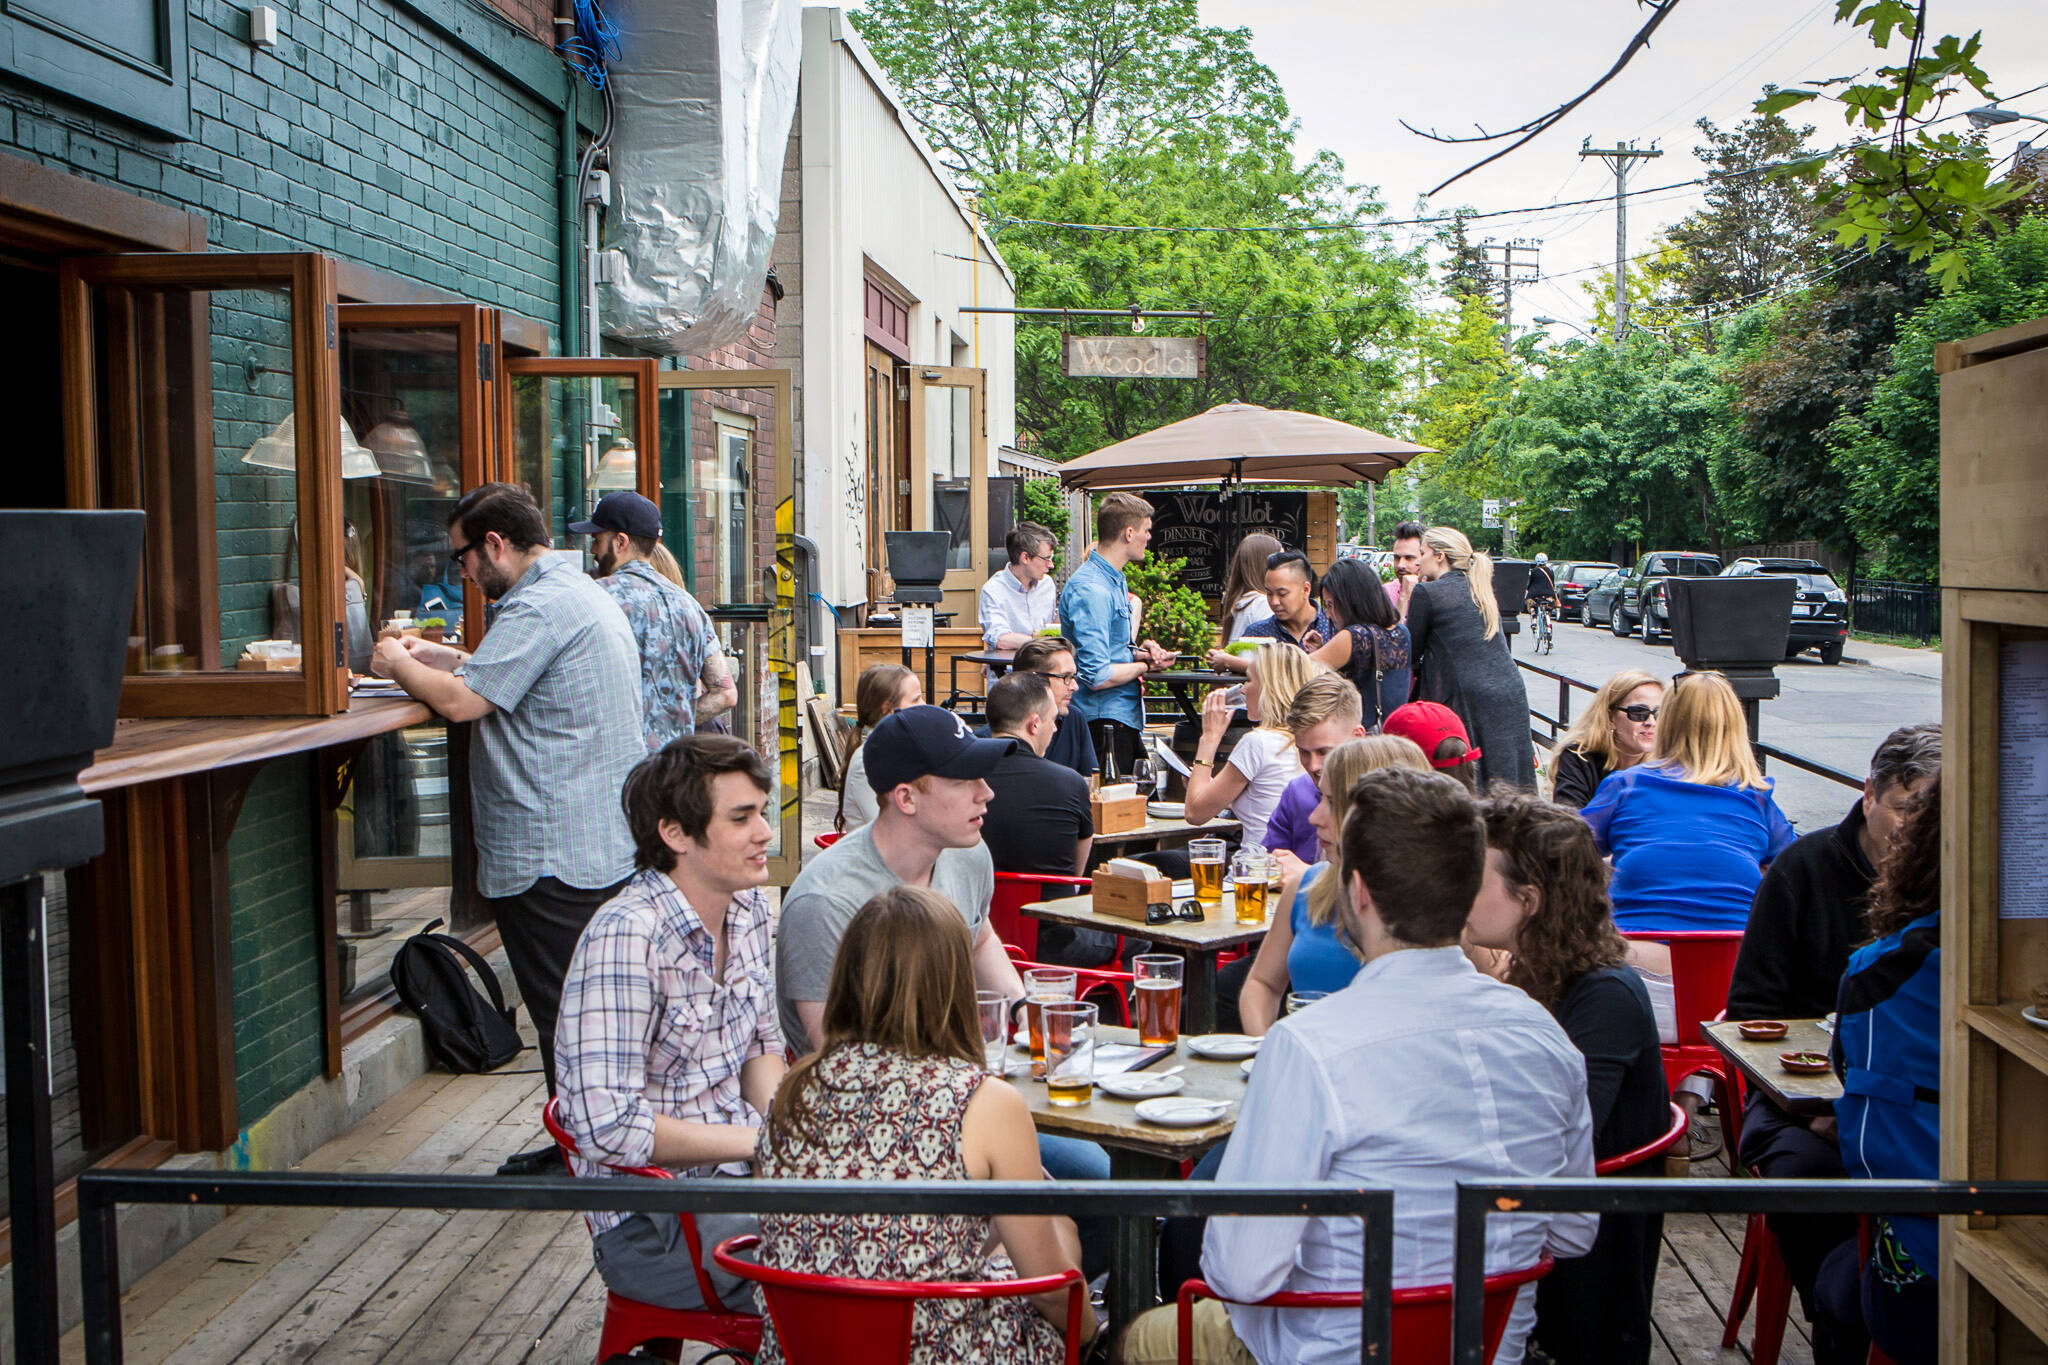 Toronto patio rules